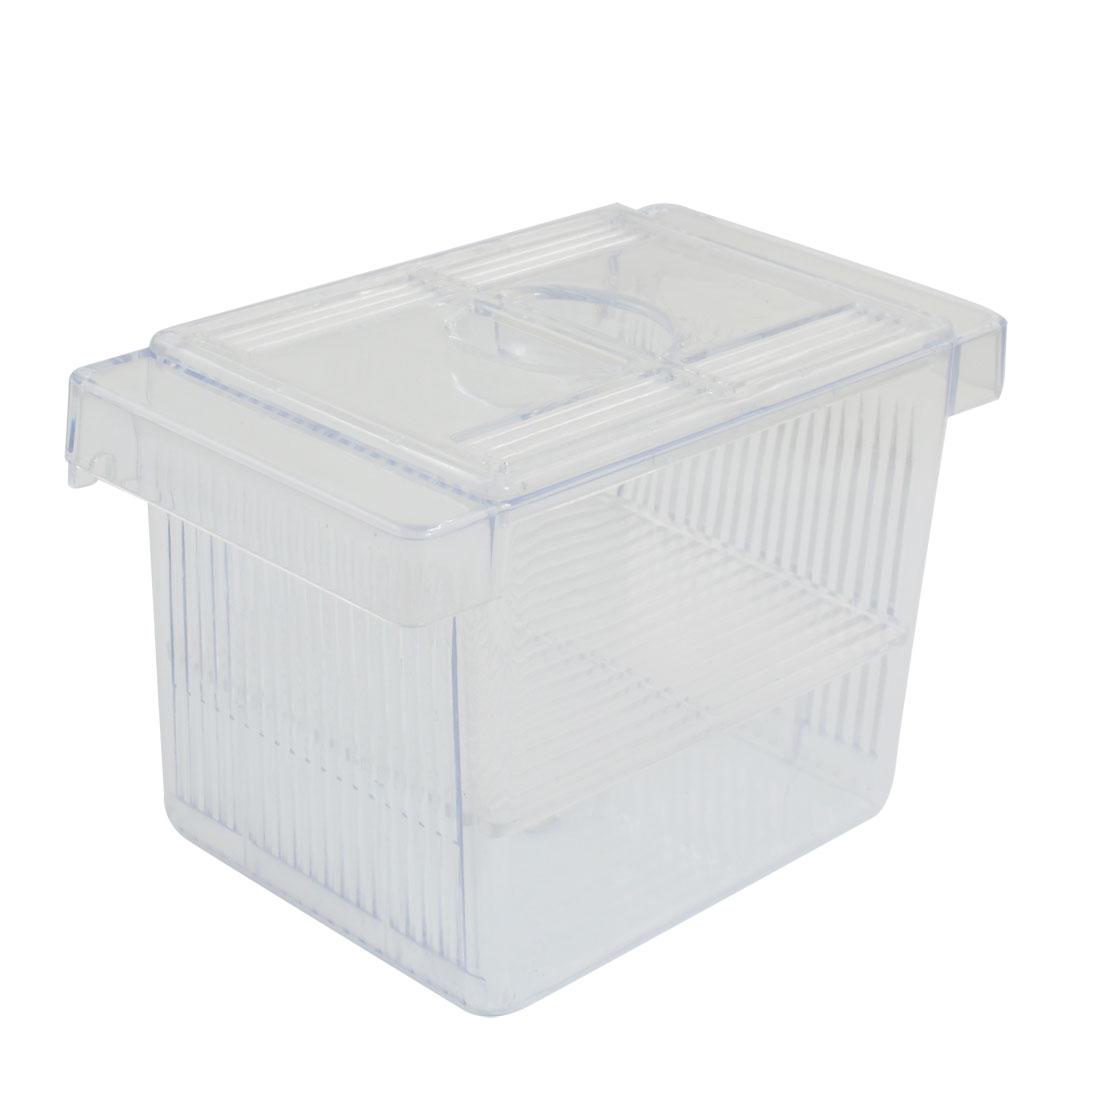 Aquarium Clear Plastic Fish Spawn Hatchery Breeding Breeder Box